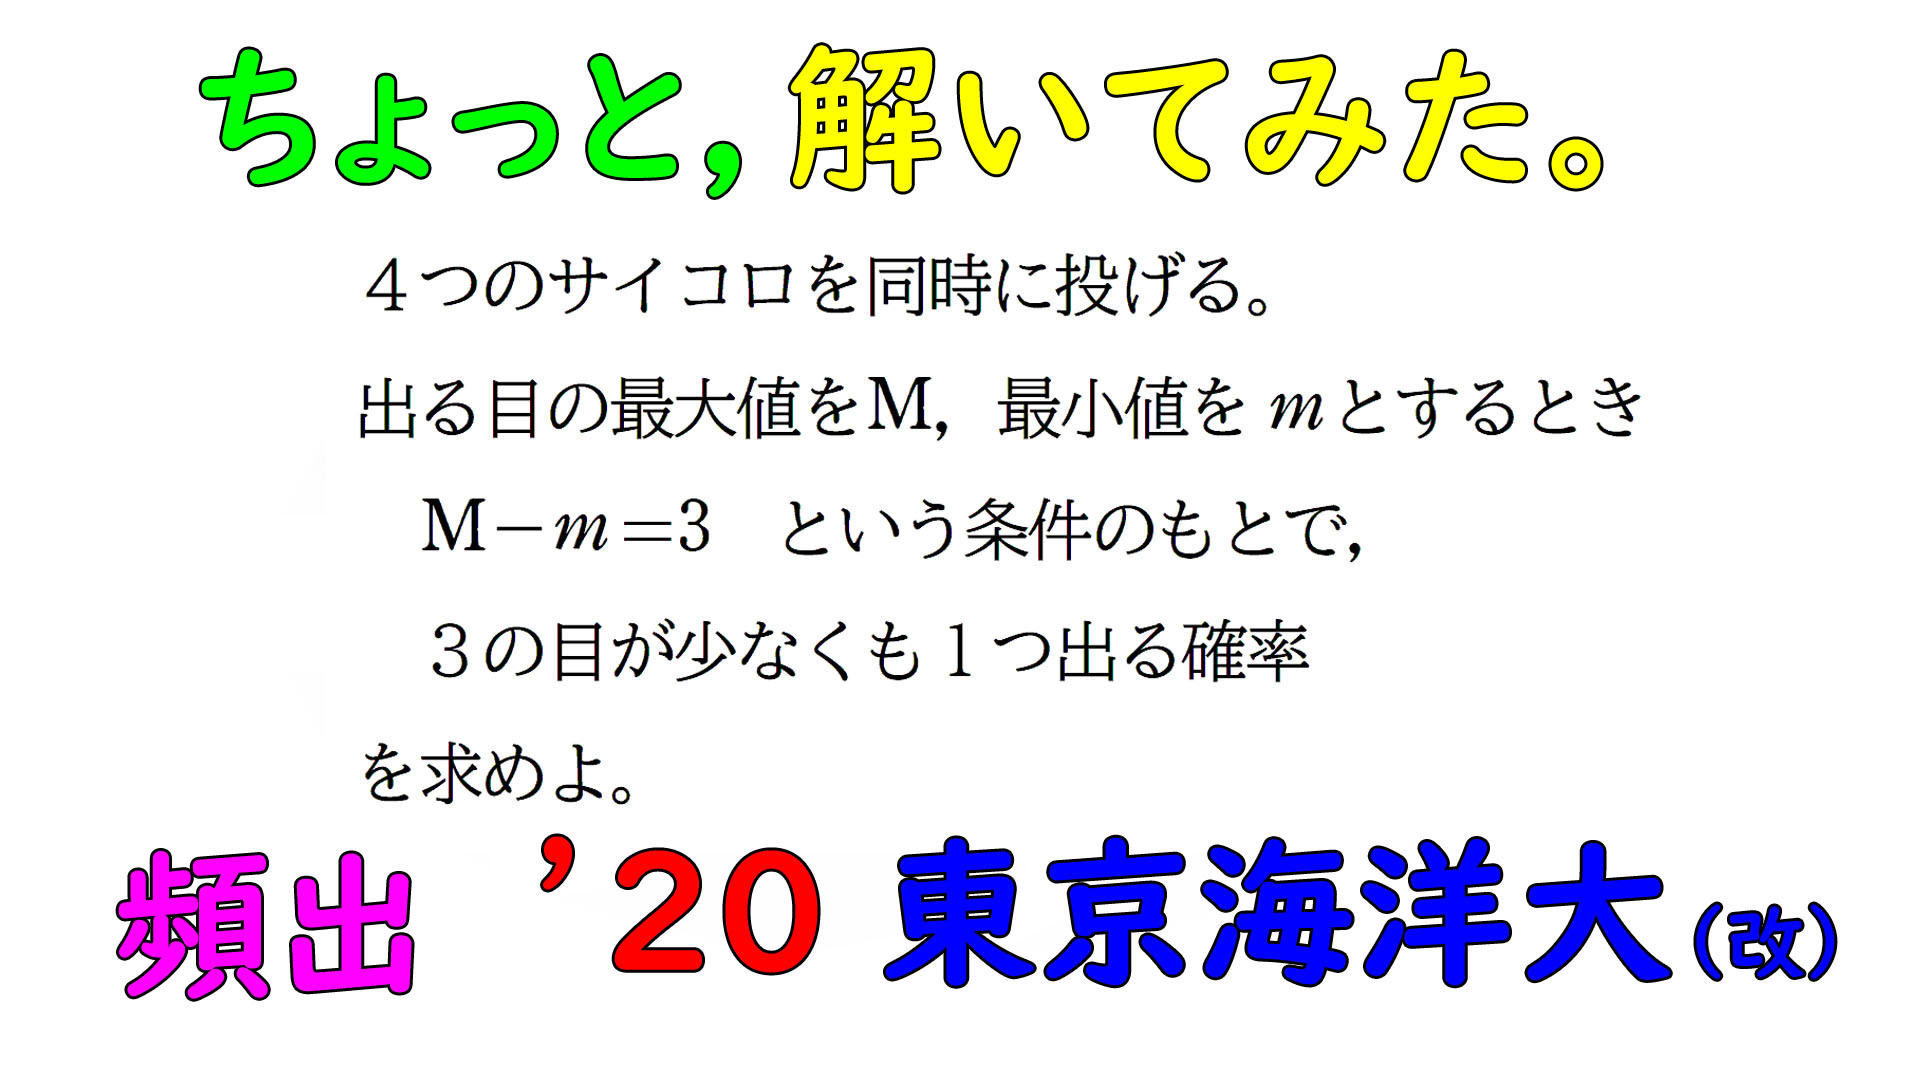 title_202108182109302a6.jpg